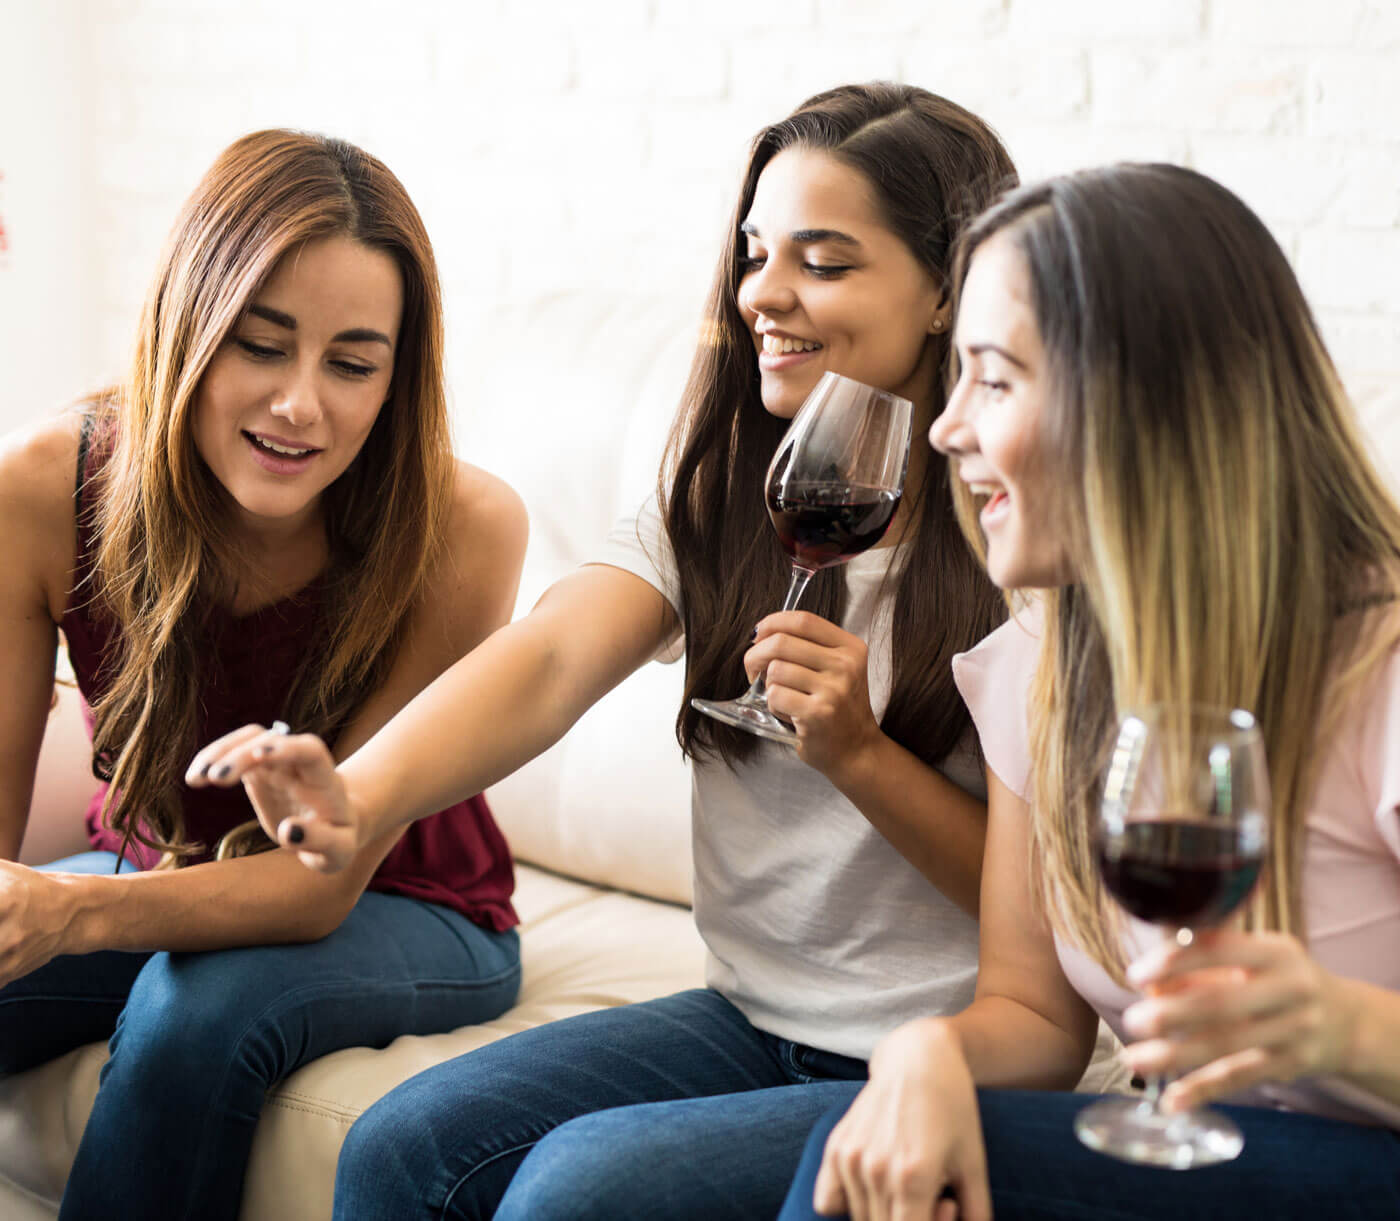 Verlobungsring Tipps